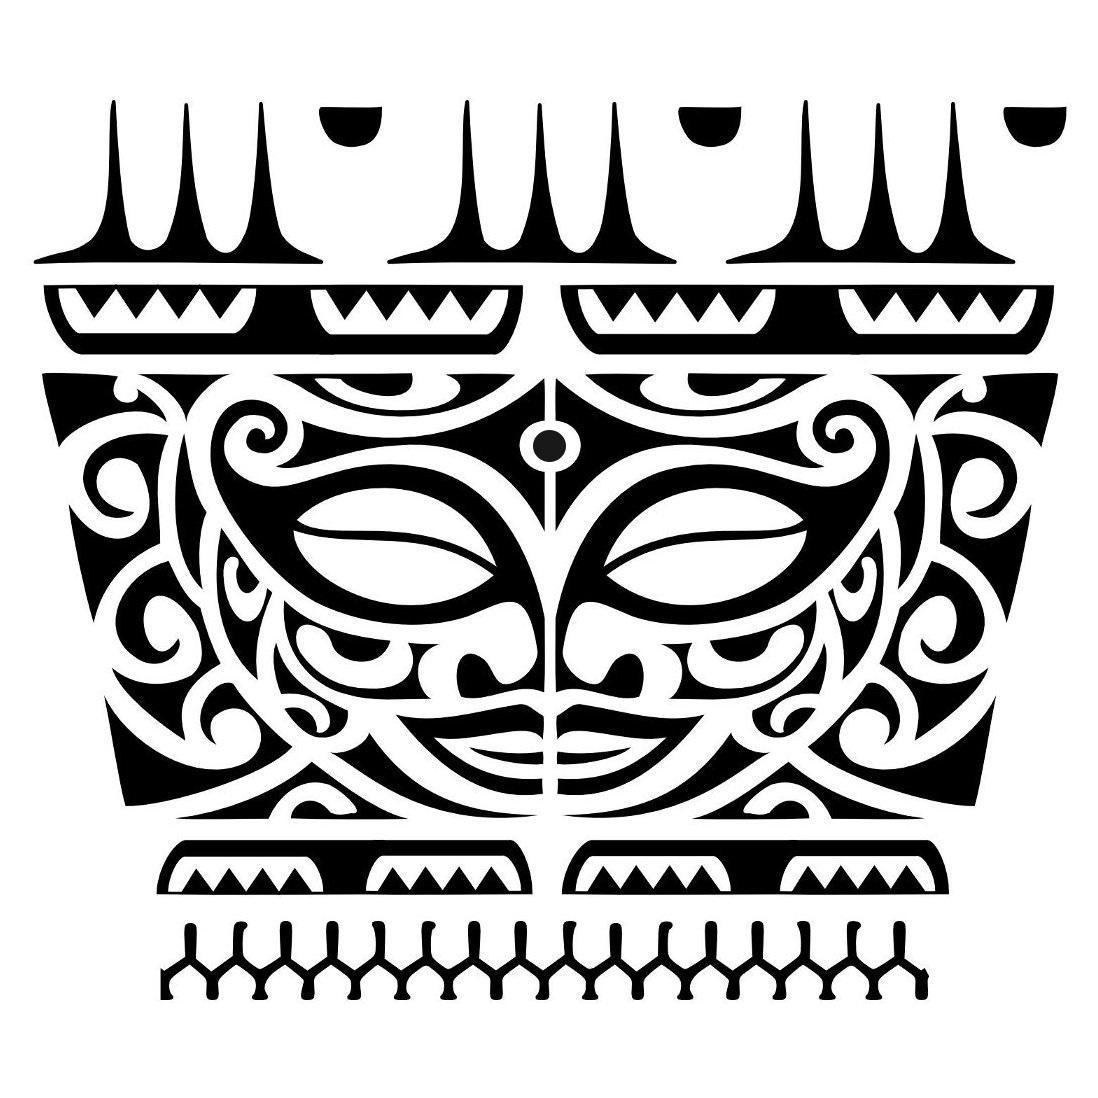 Maori Face Armband Tattoo Design